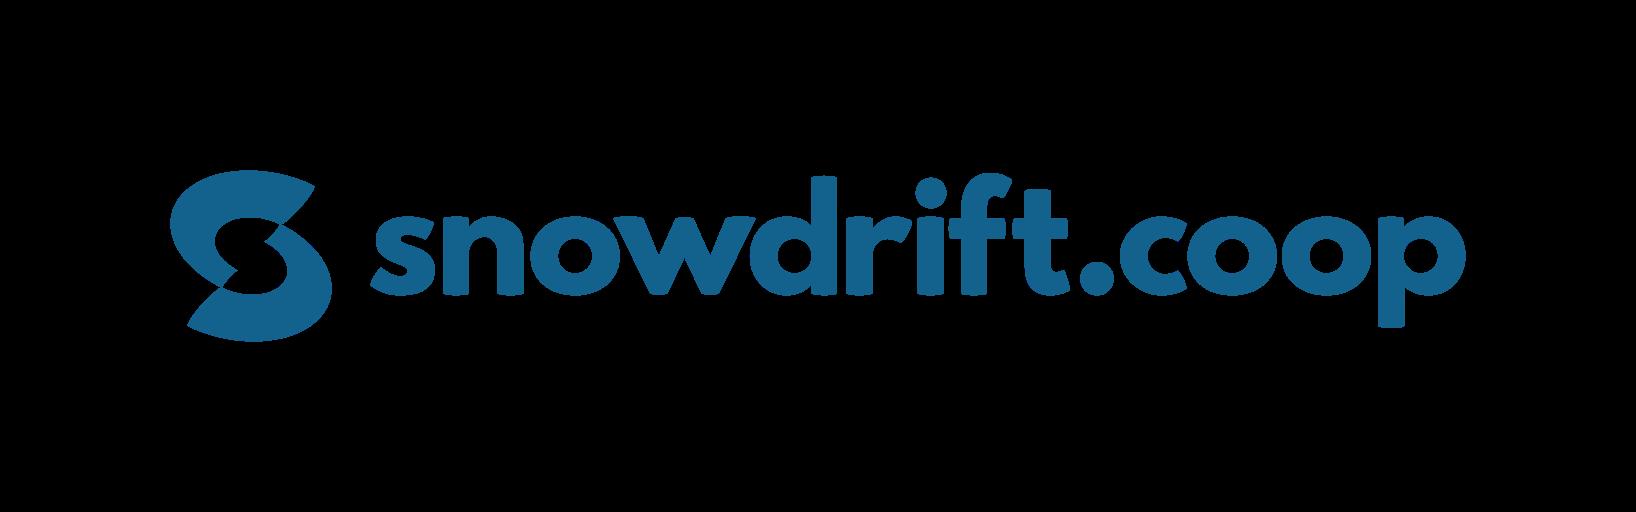 snowdrift-logo_symbol-wordmark_dark-blue.png